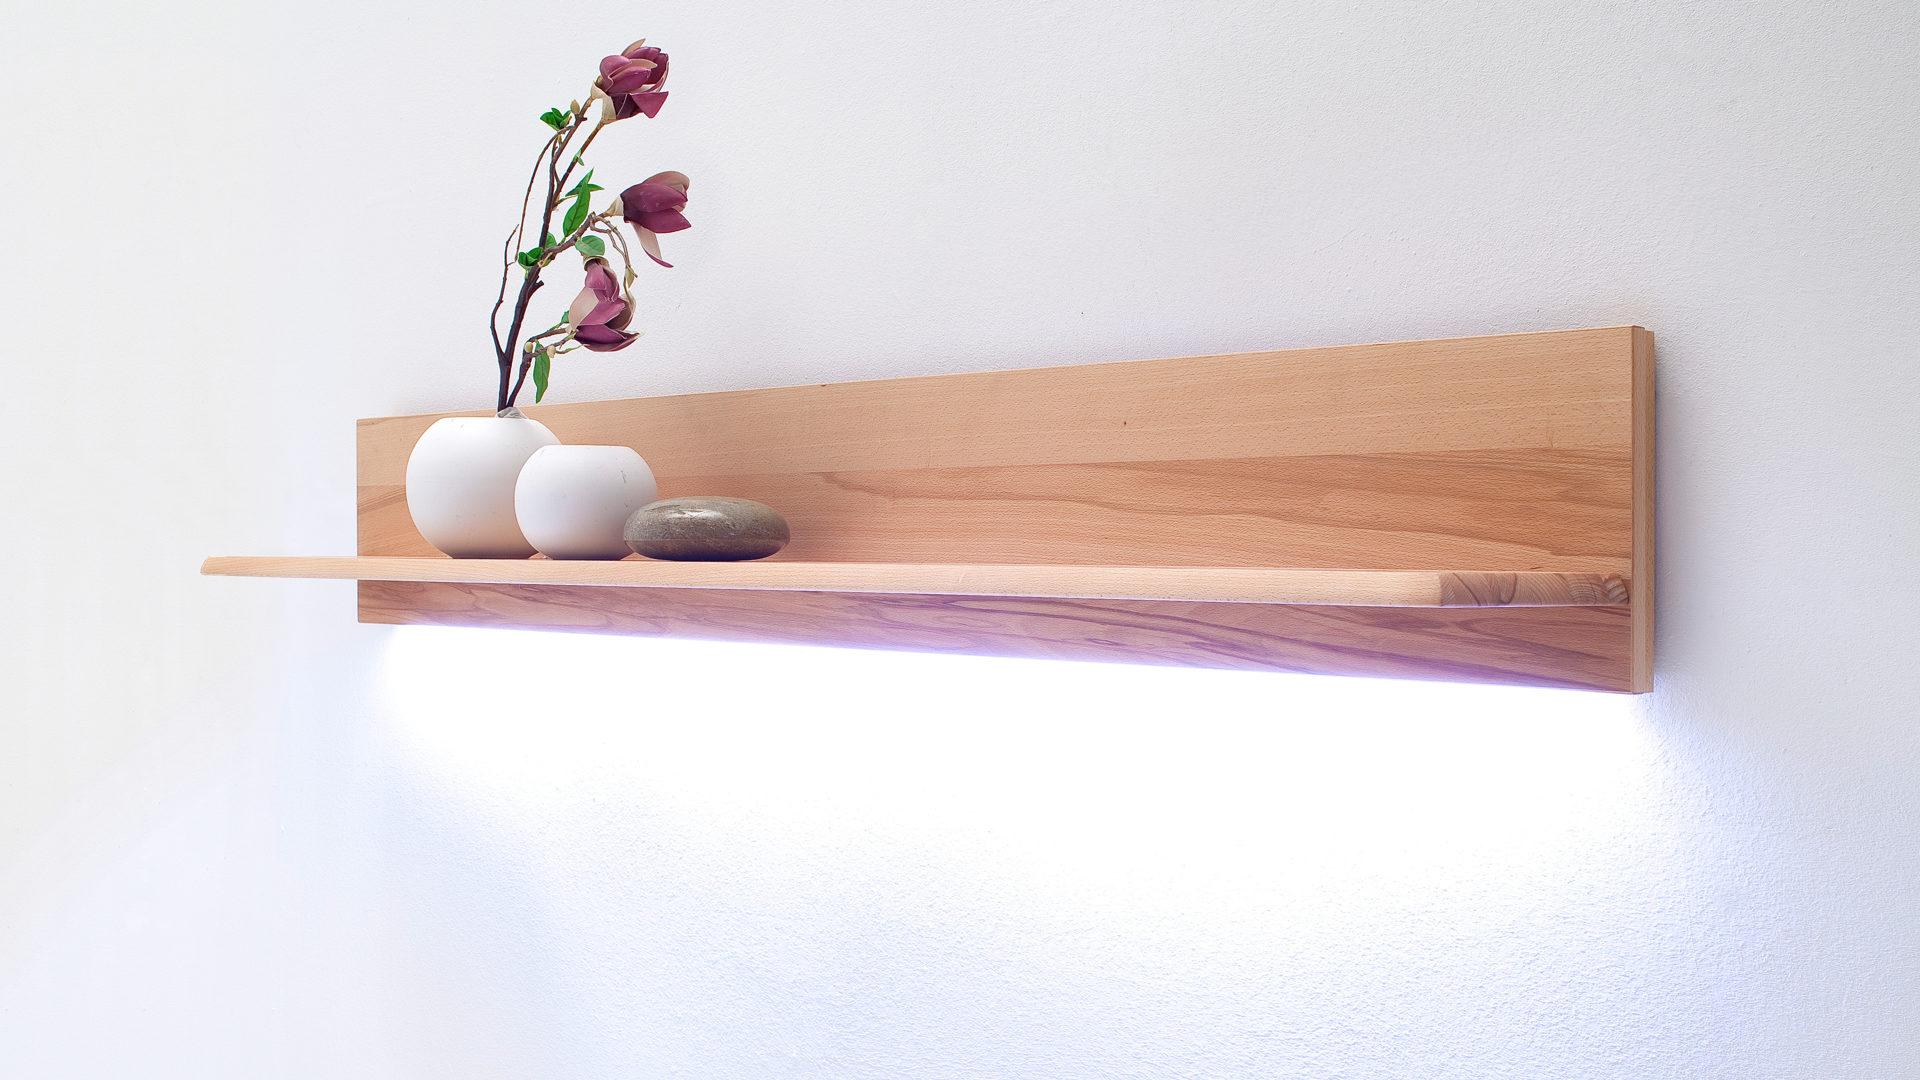 Mobila.de | Räume | Wohnzimmer | Regale + Raumteiler | Wandboard ...